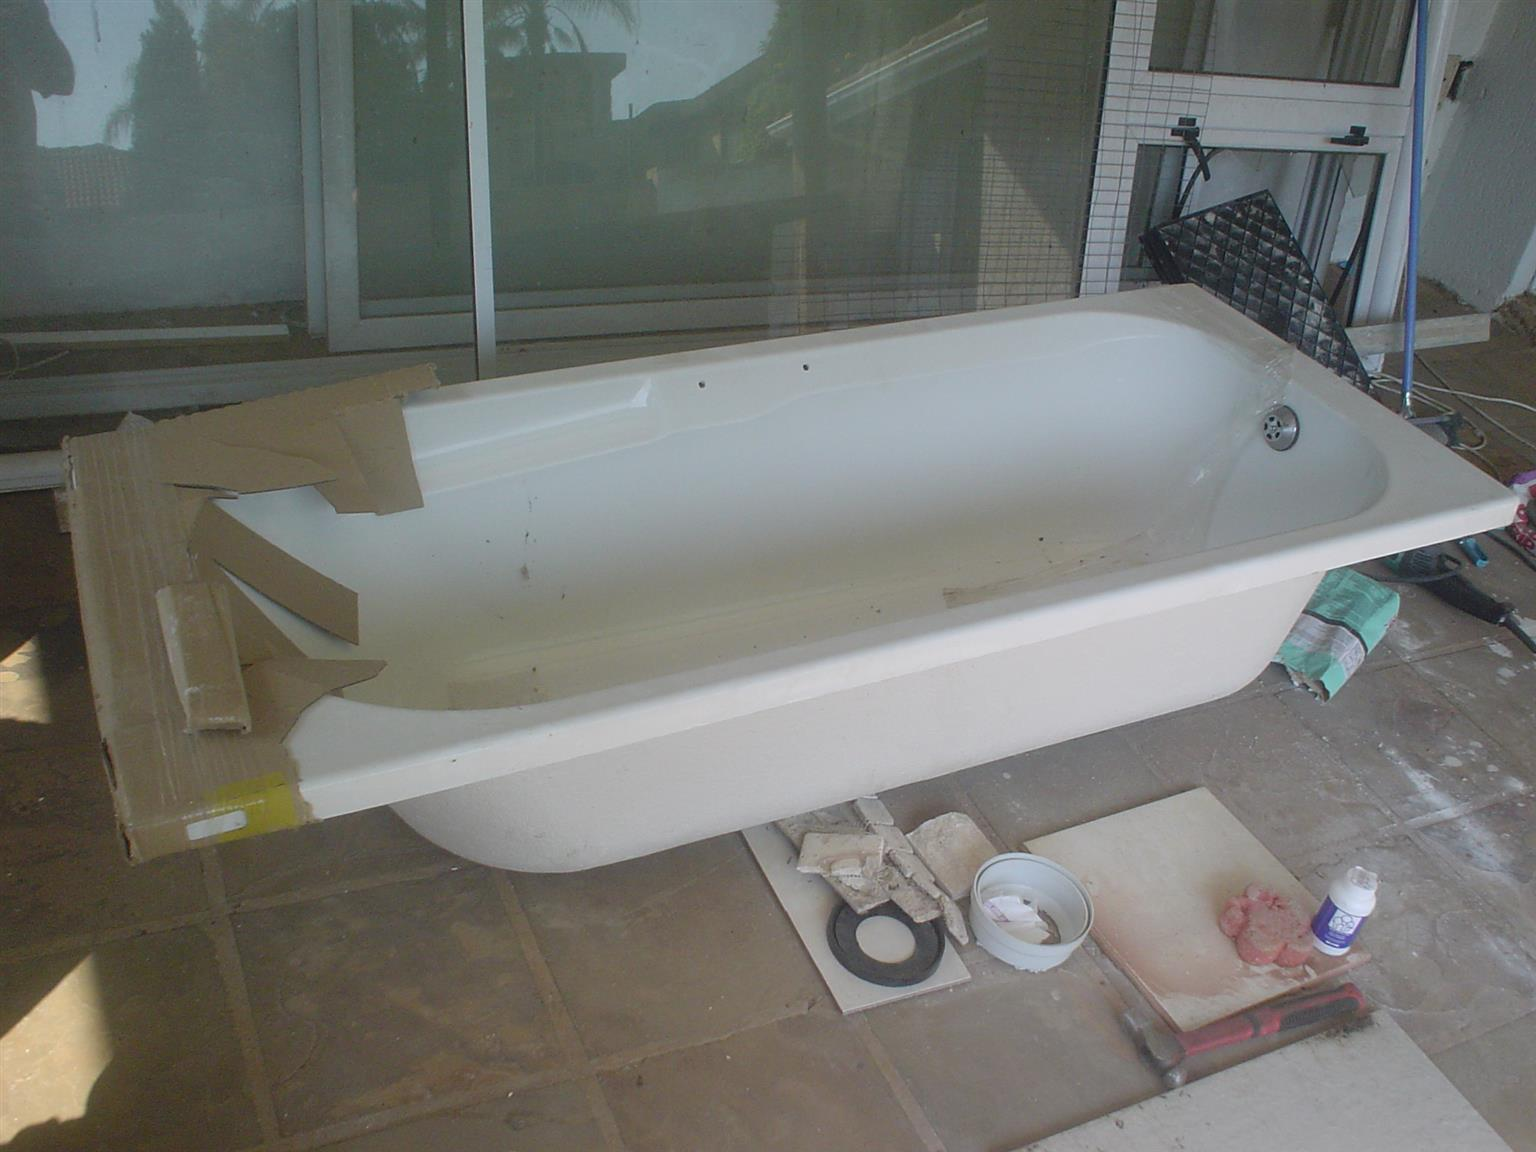 Bath,plexi, bran new 1700x750mm with waste plug etc.